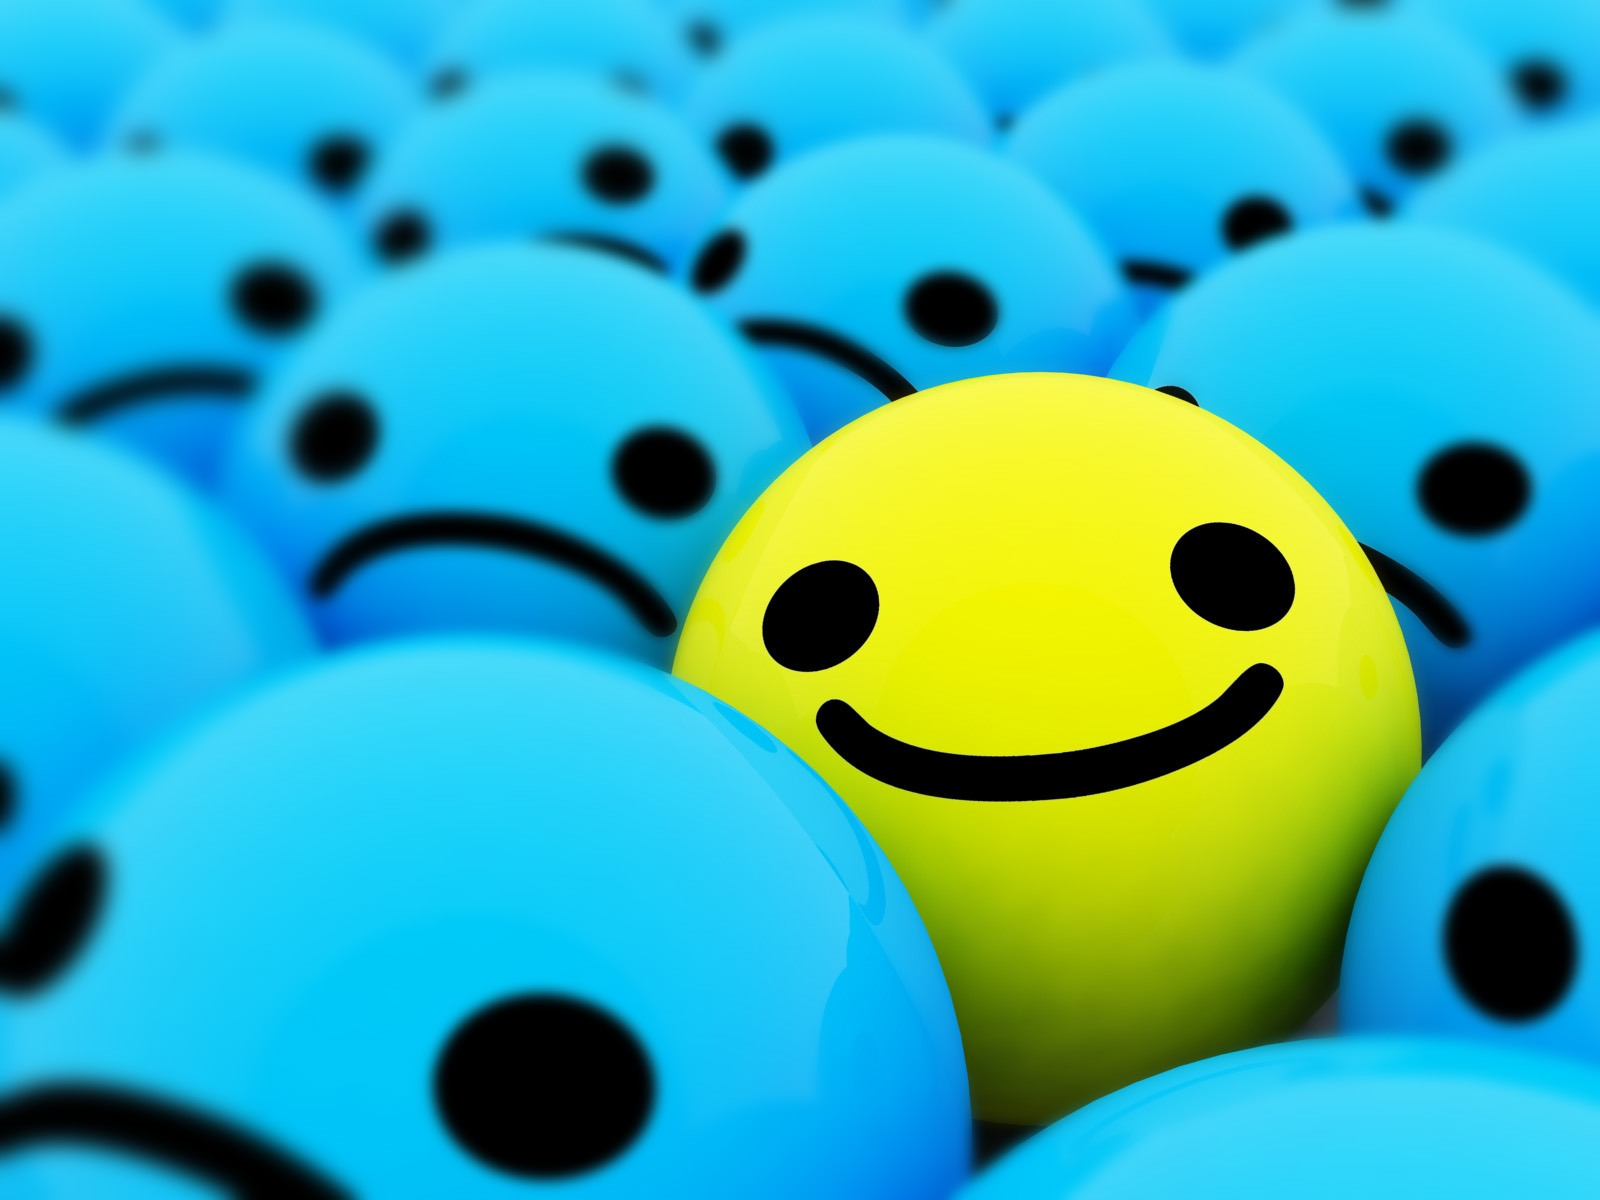 Emoticons   Smile desktop wallpaper 1600x1200